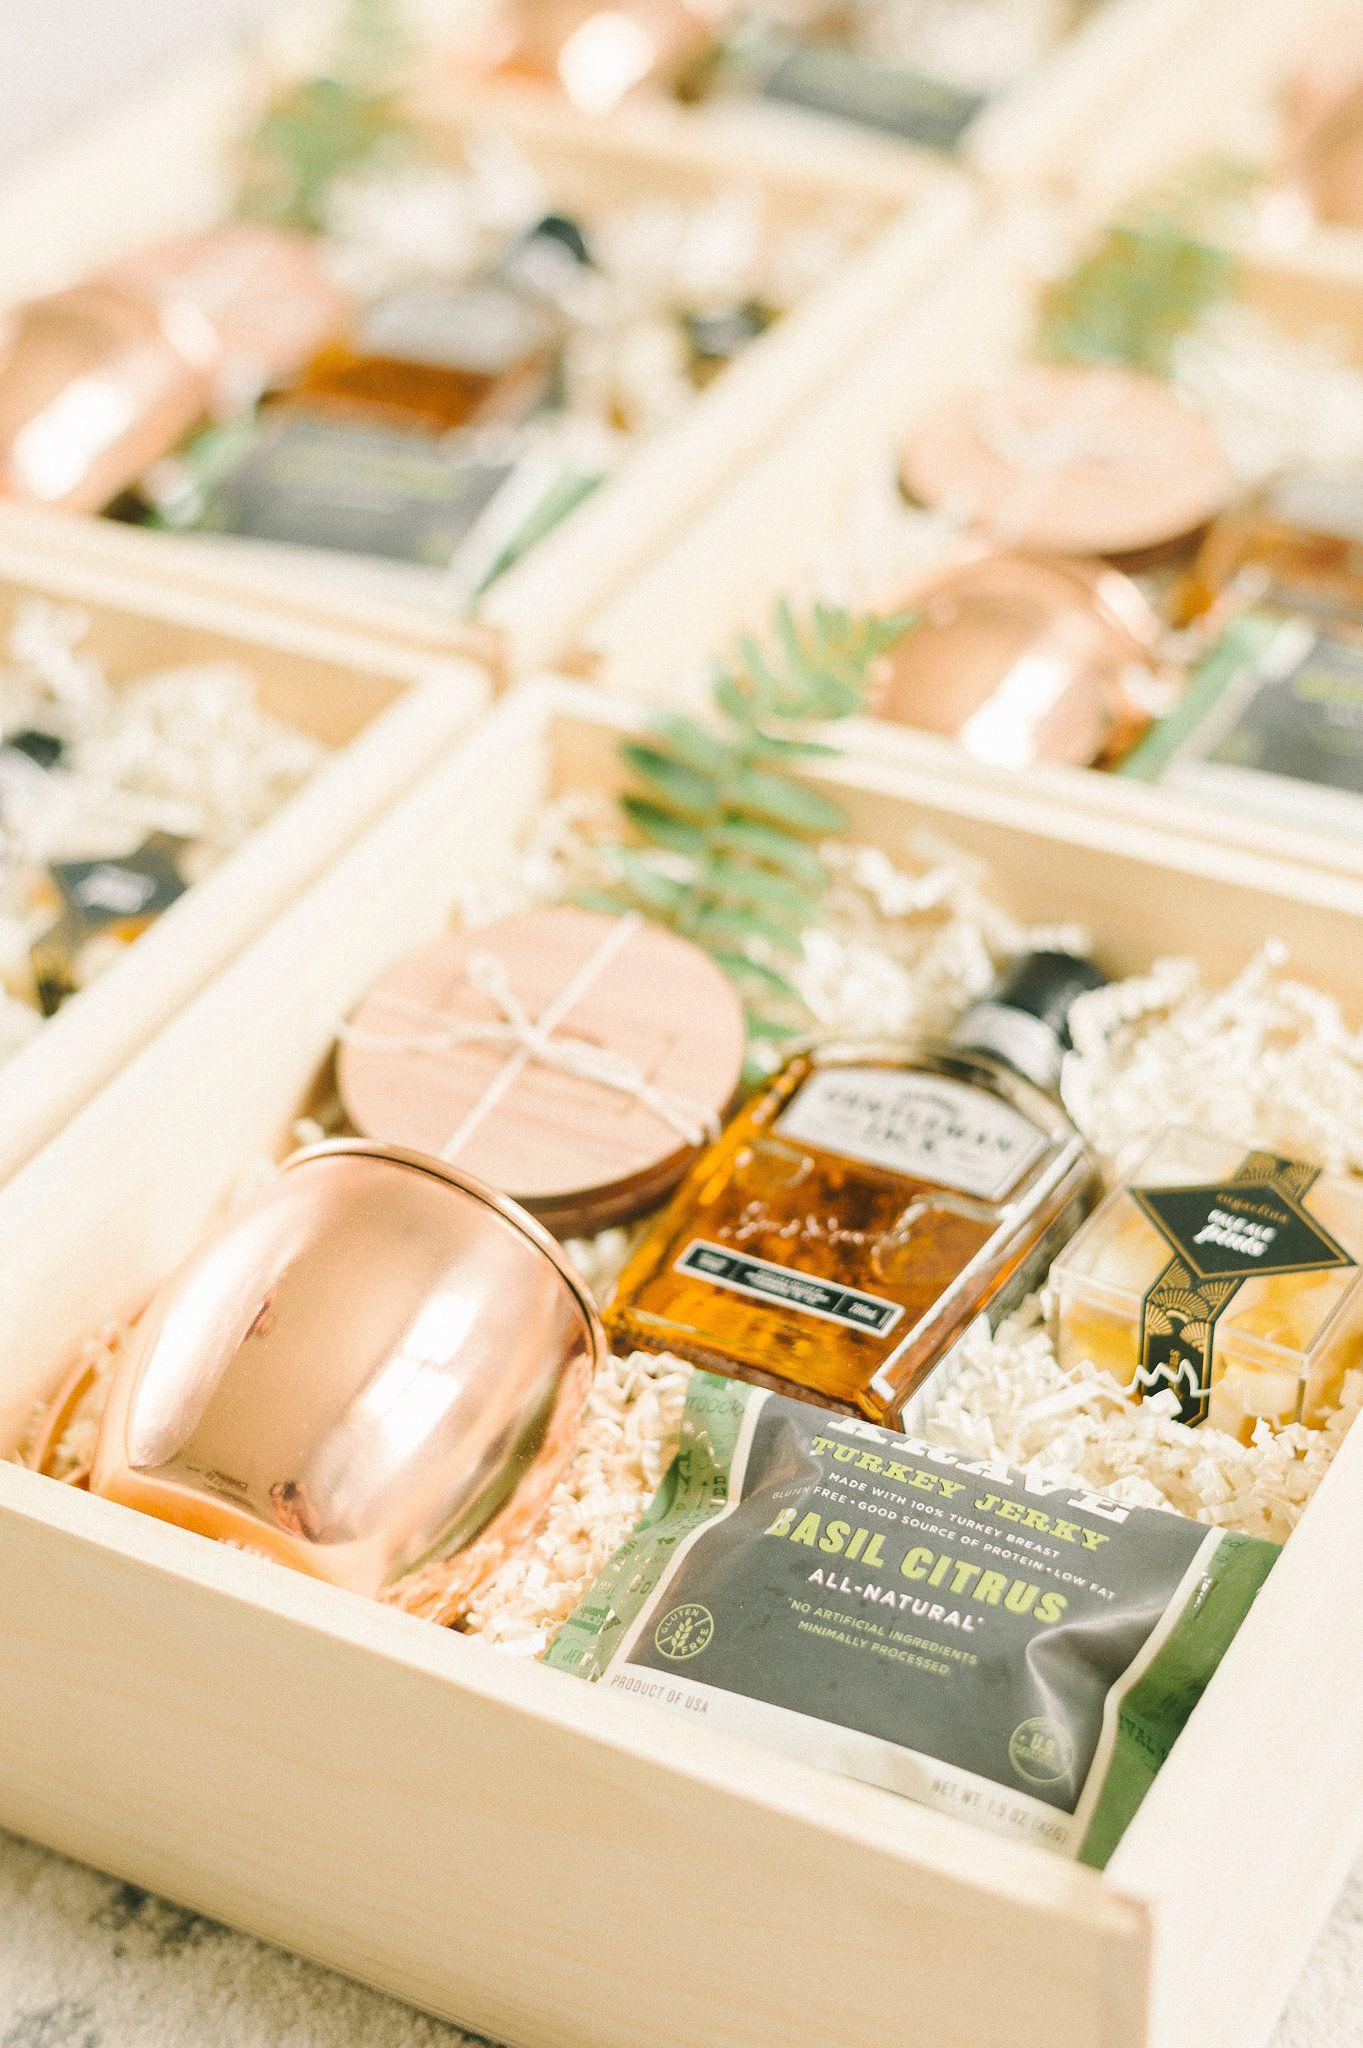 62 unique ideas for bridesmaid gifts wedding